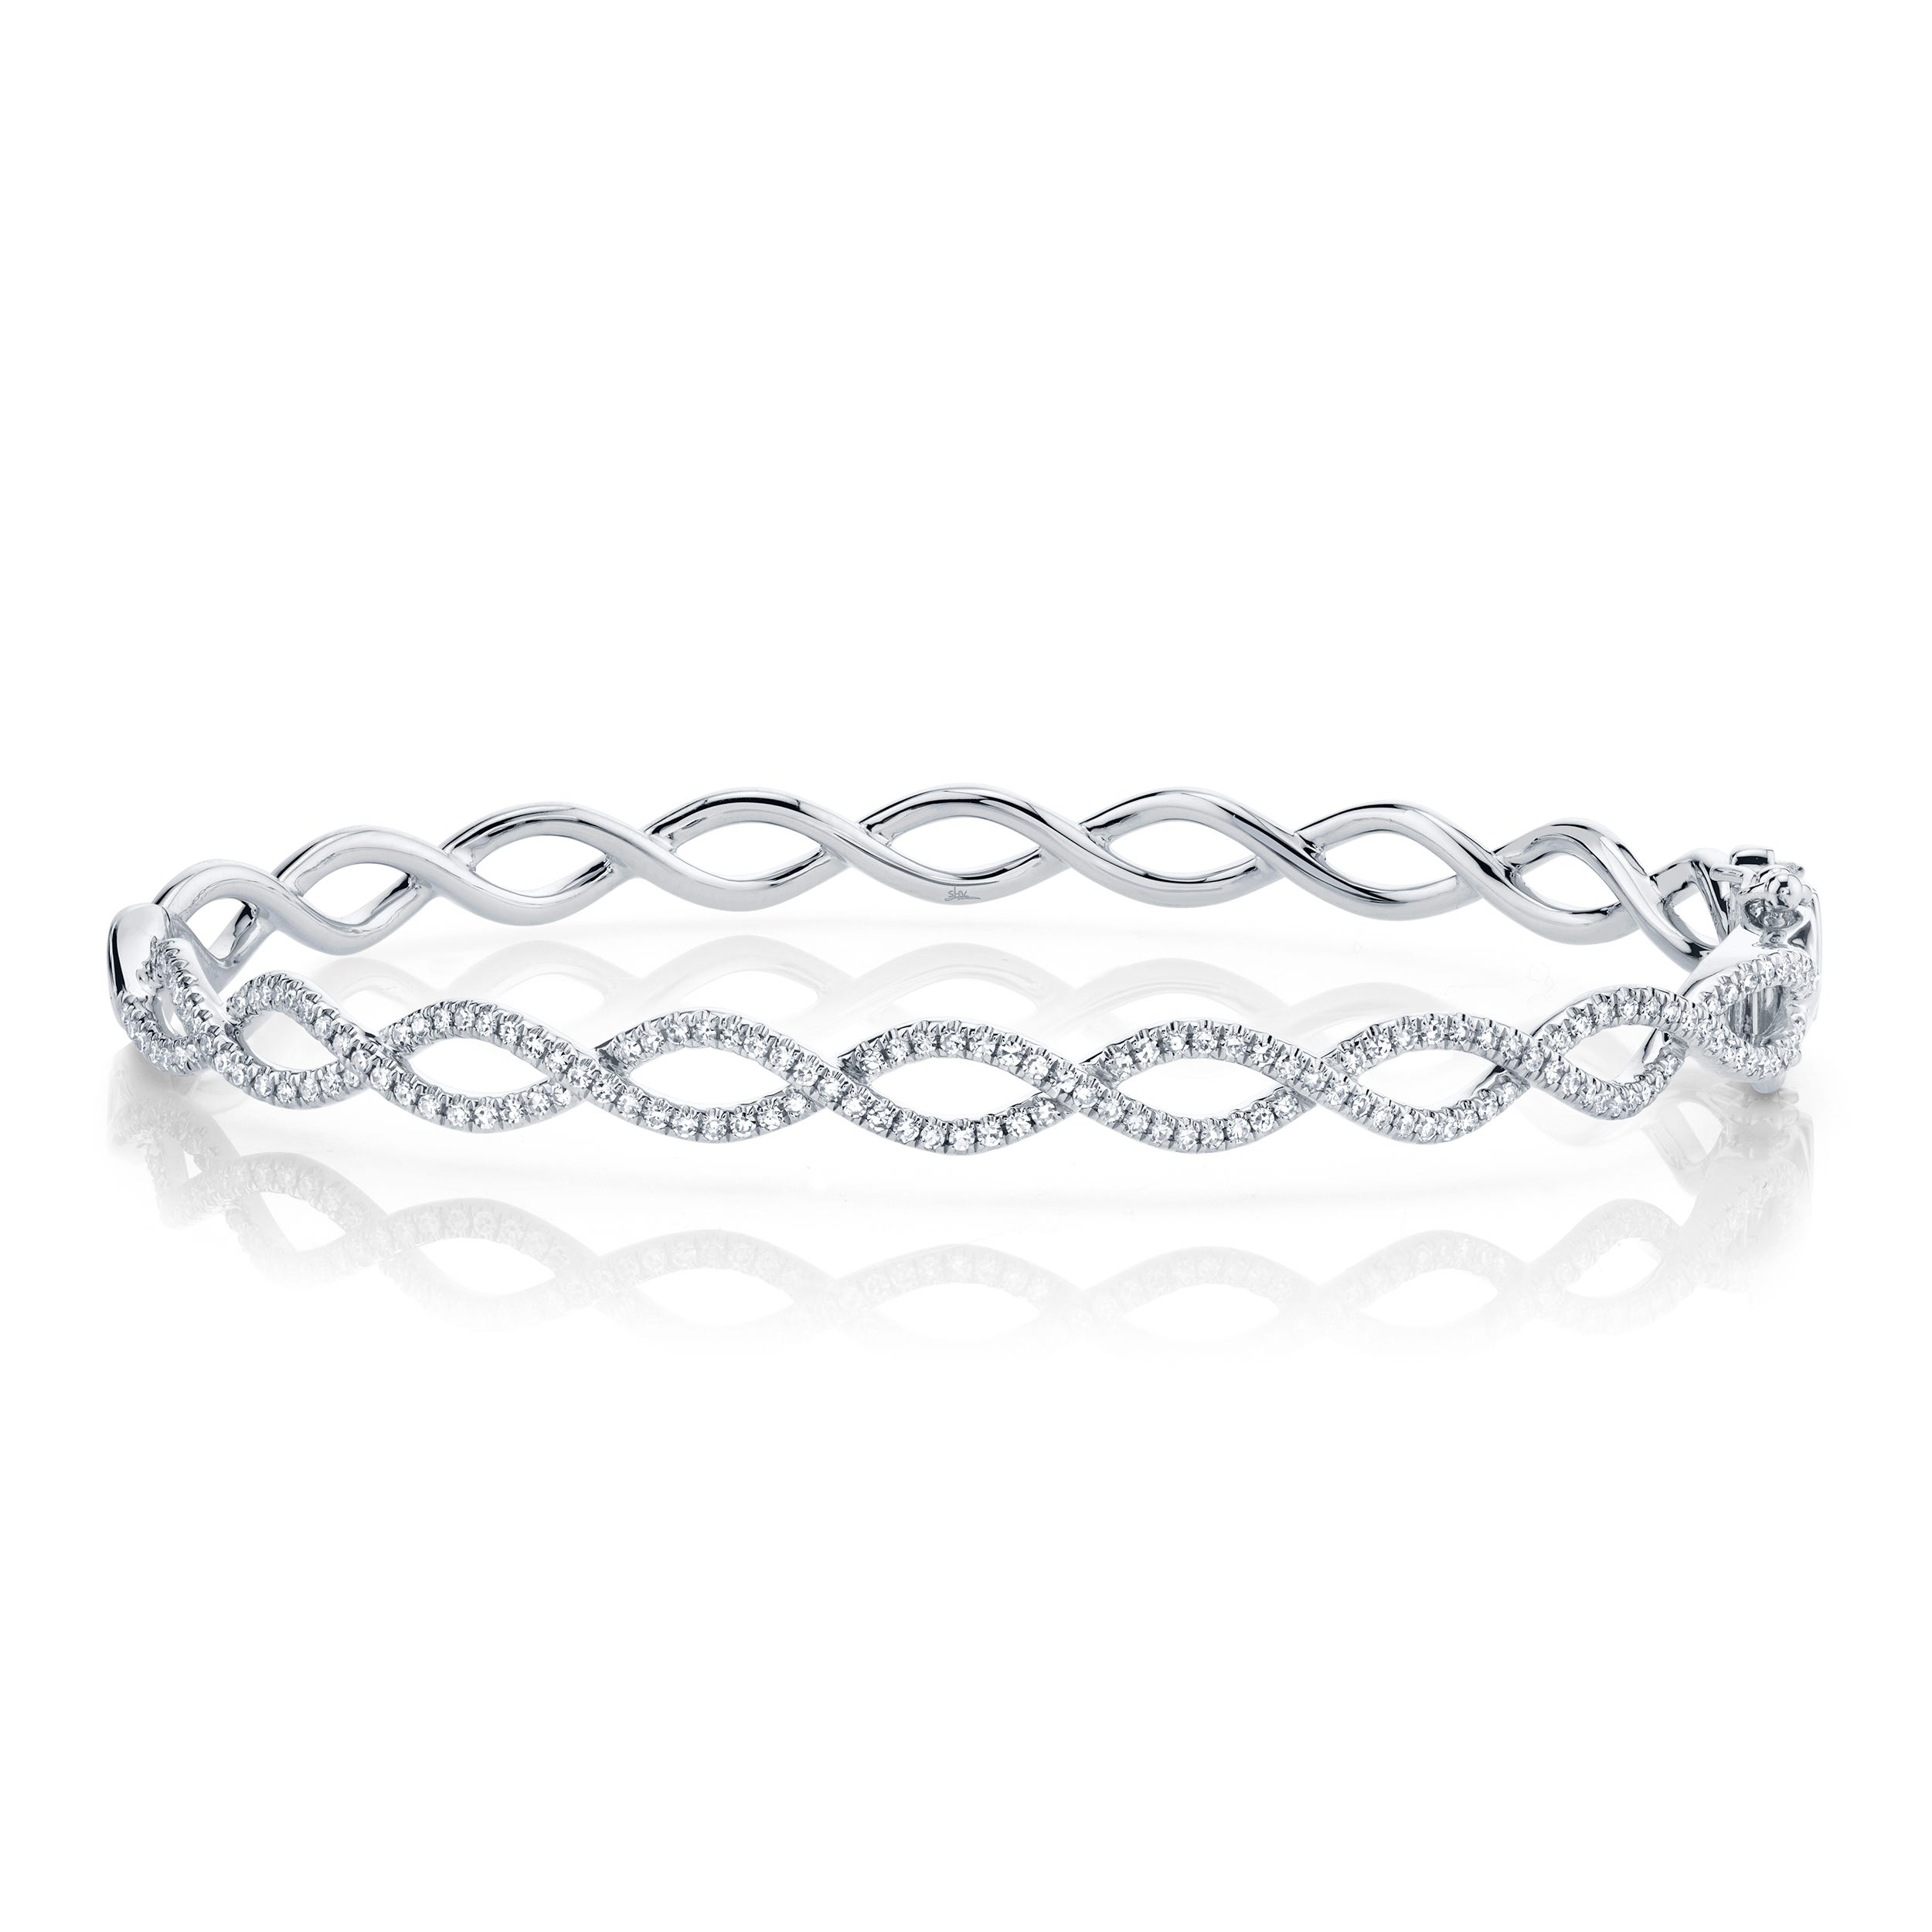 Shy Creation Diamond Crisscross Bangle Bracelet in 14k White Gold SC55004965ZS